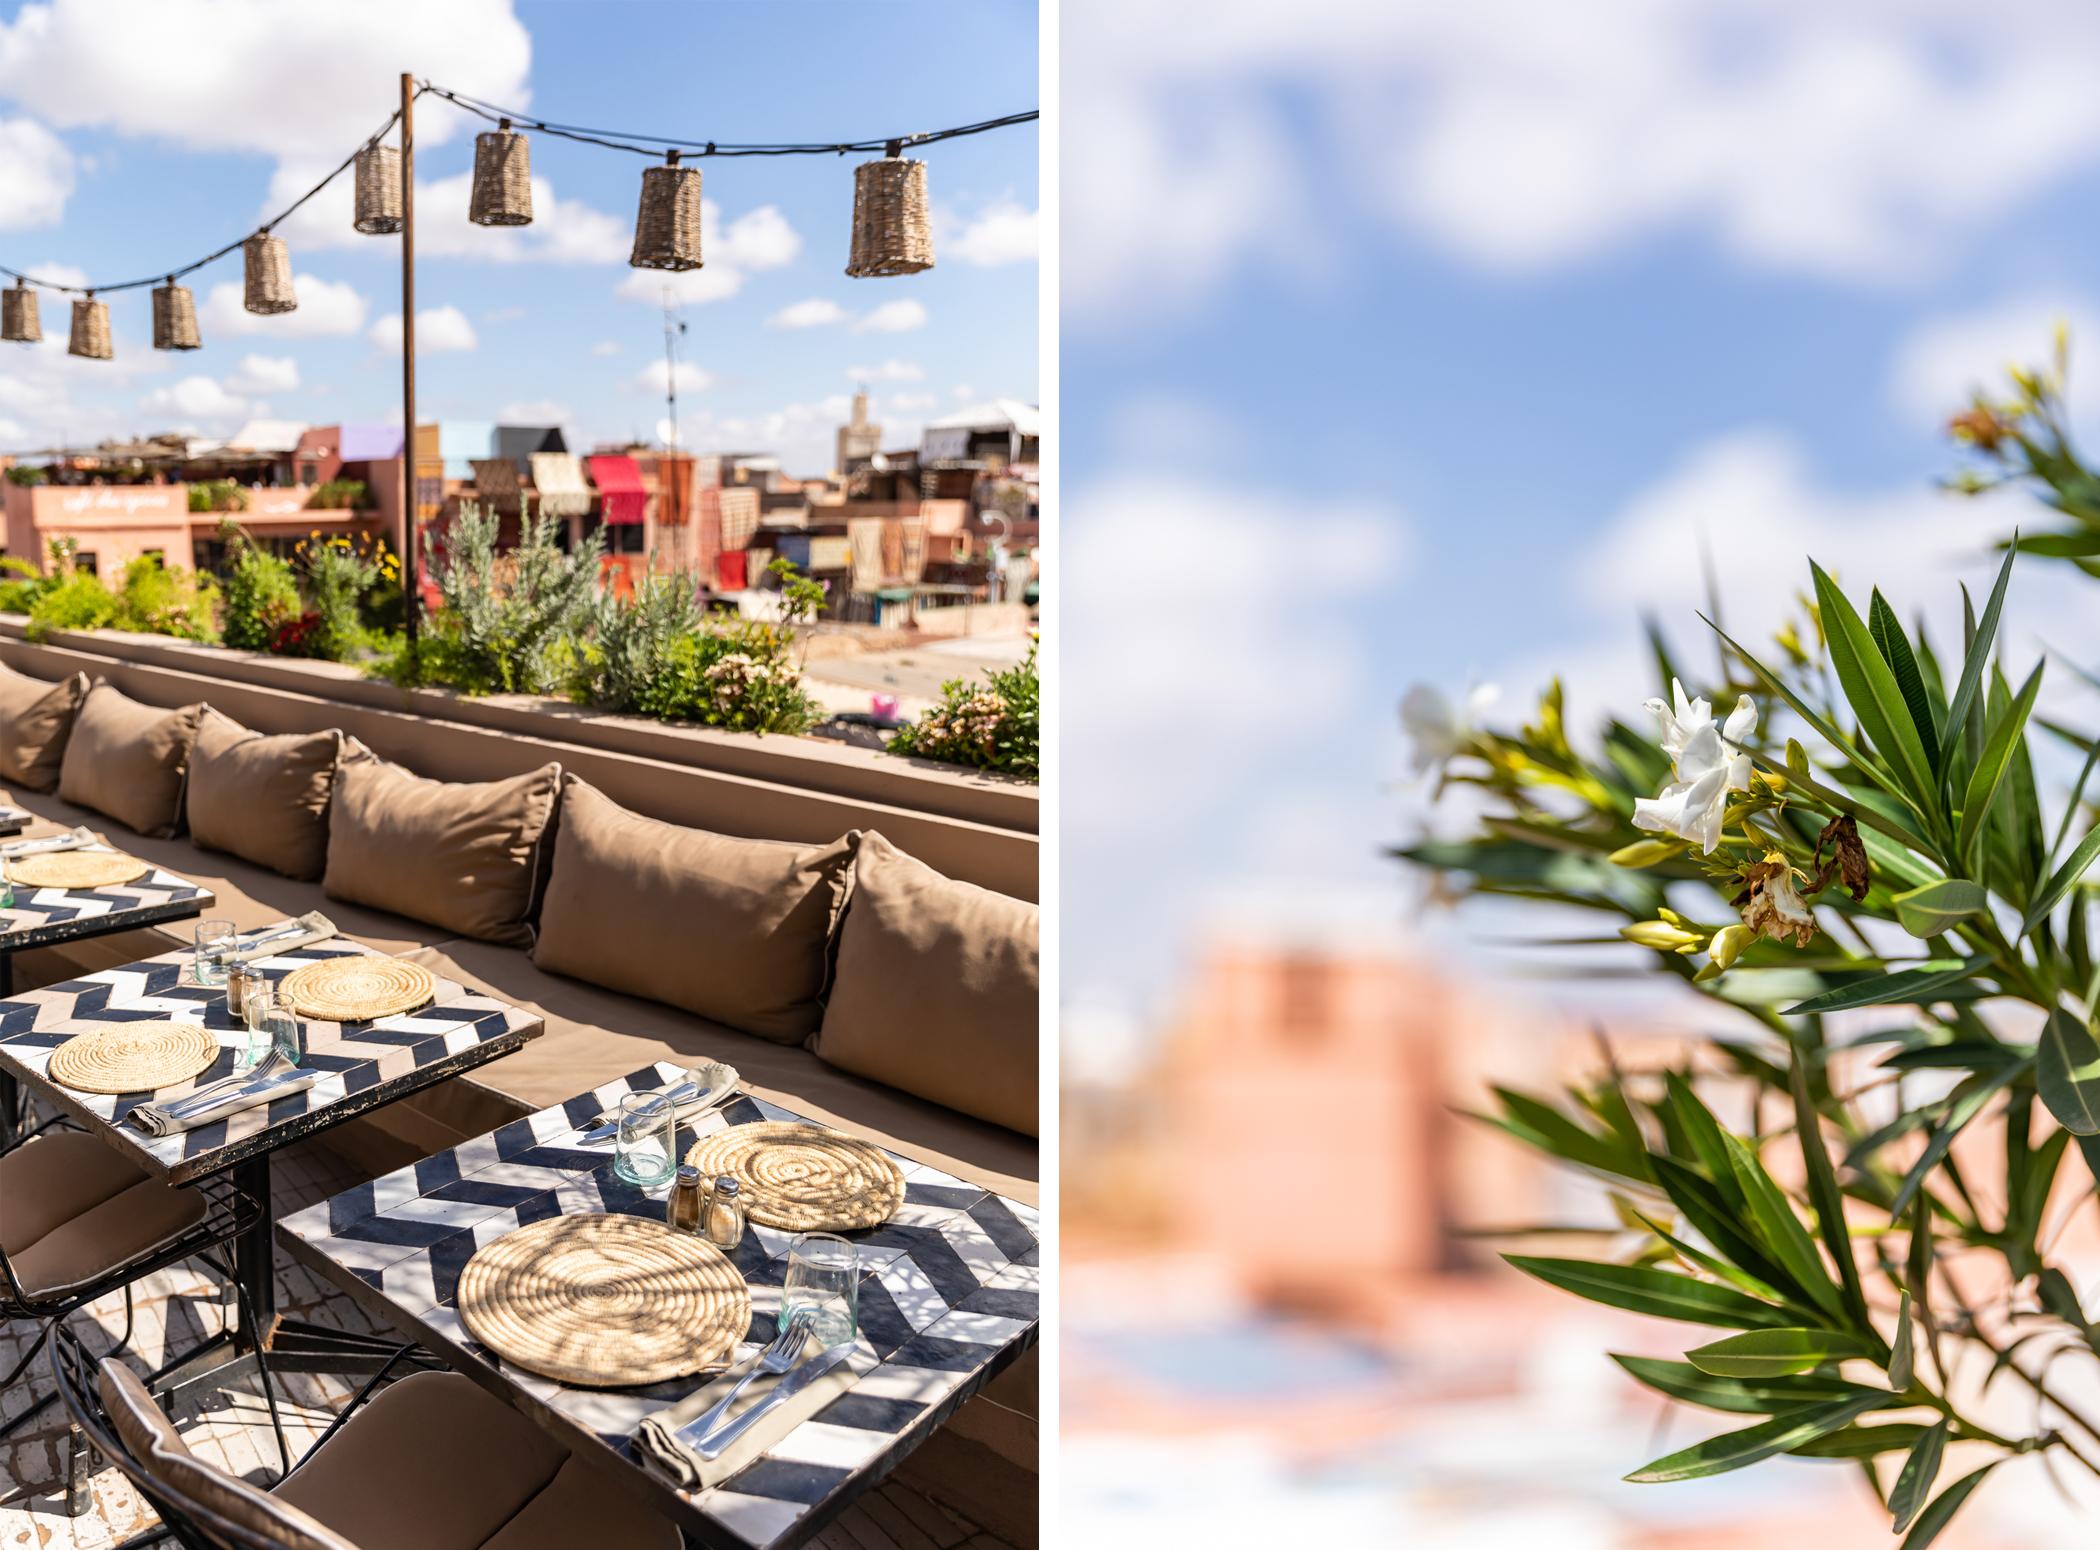 homtastics-Nomad-Restaurant-Marrakech-1050x775@2x